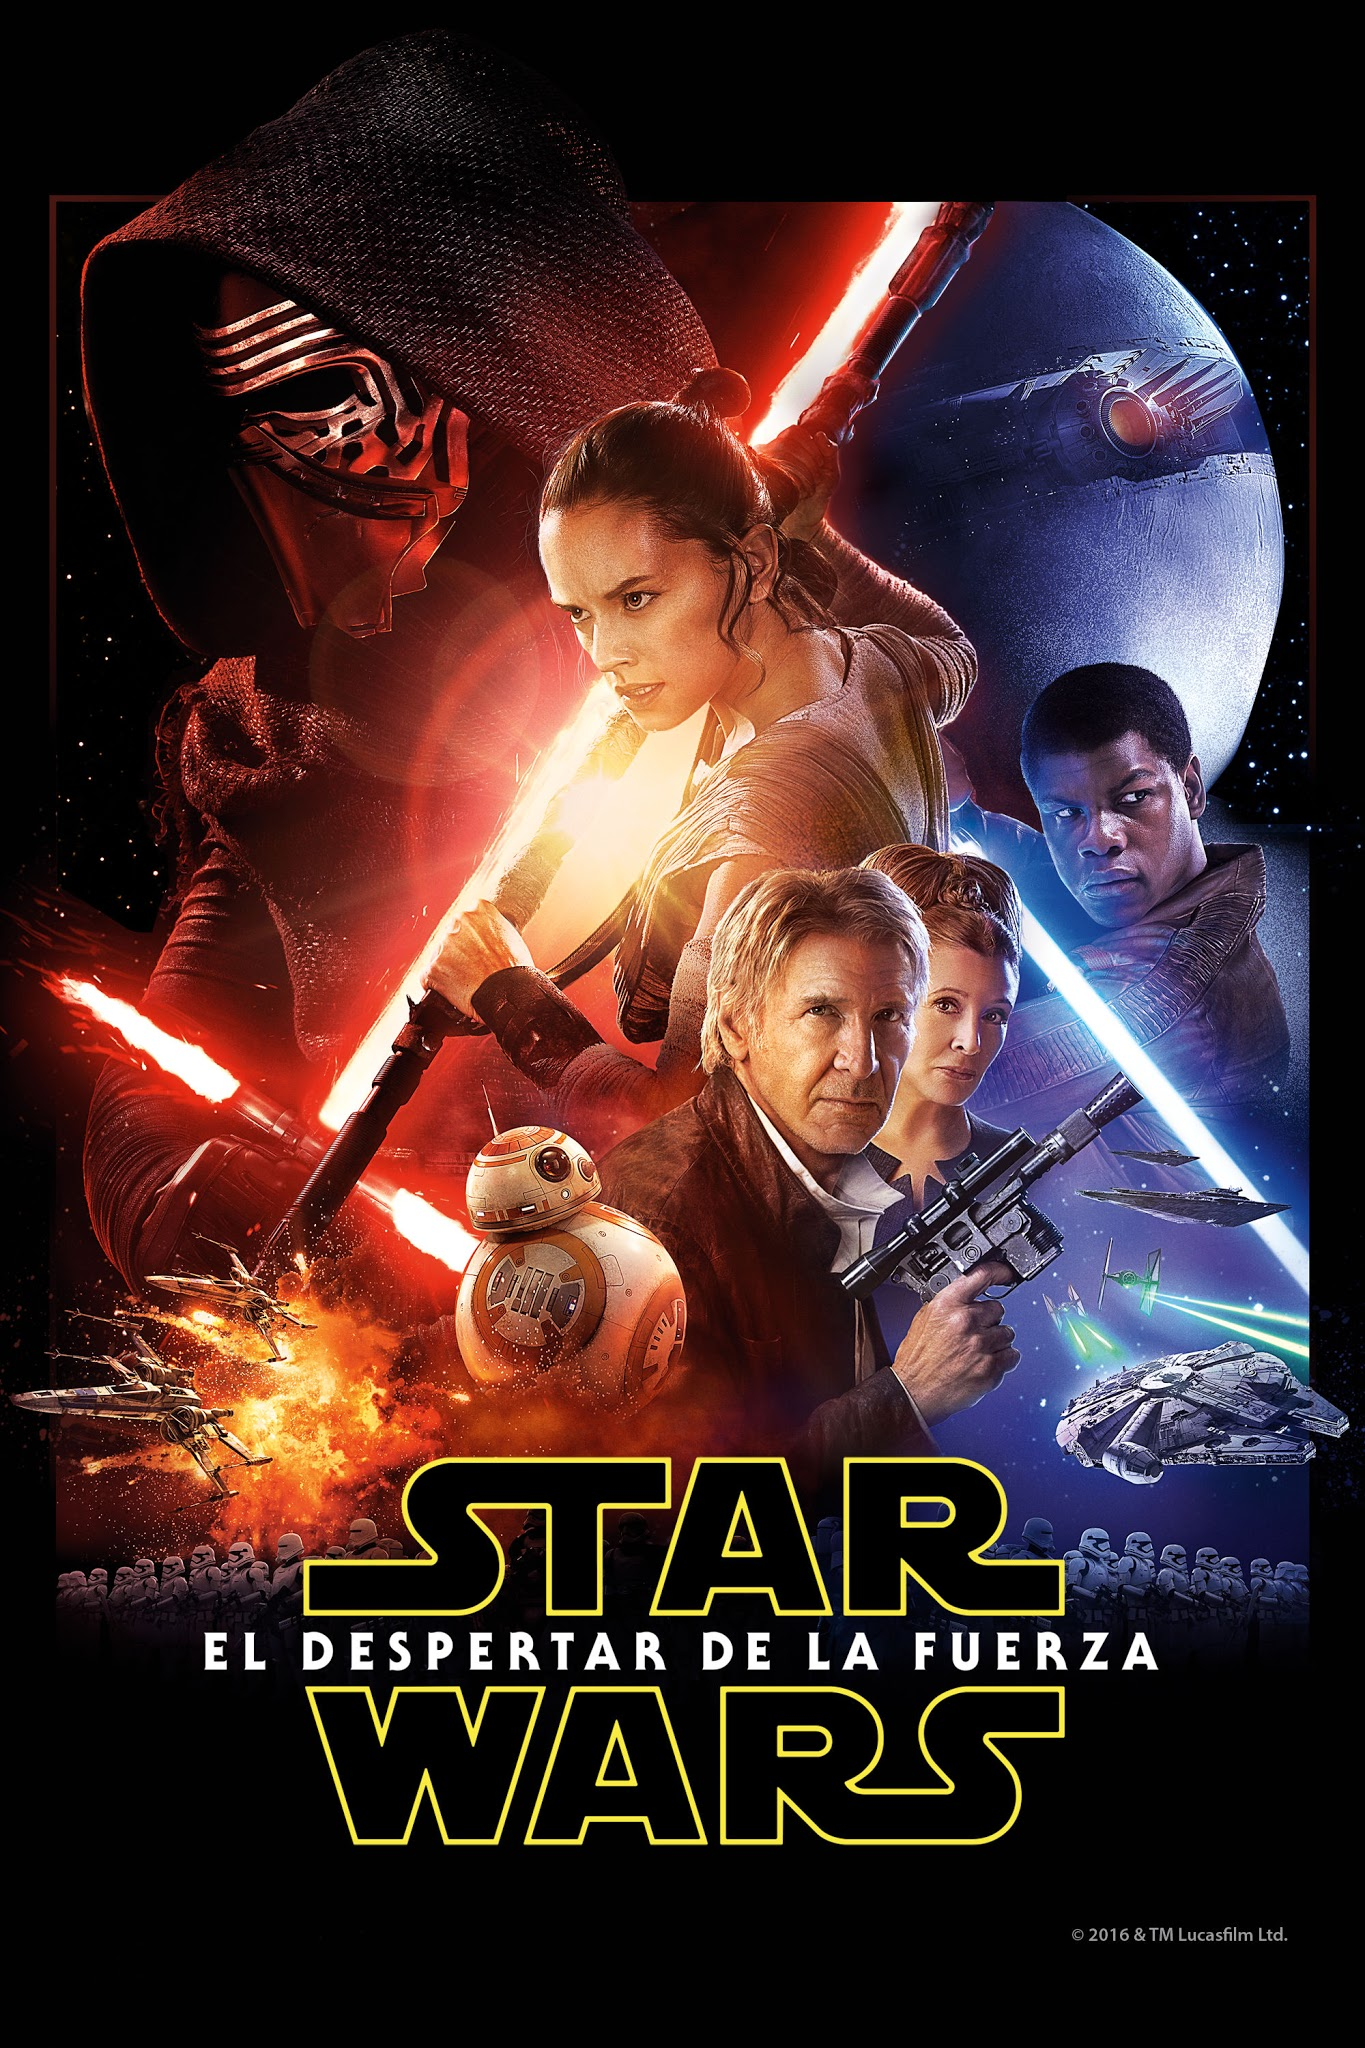 Png De Películas! Cover De Star Wars  El Despertar De